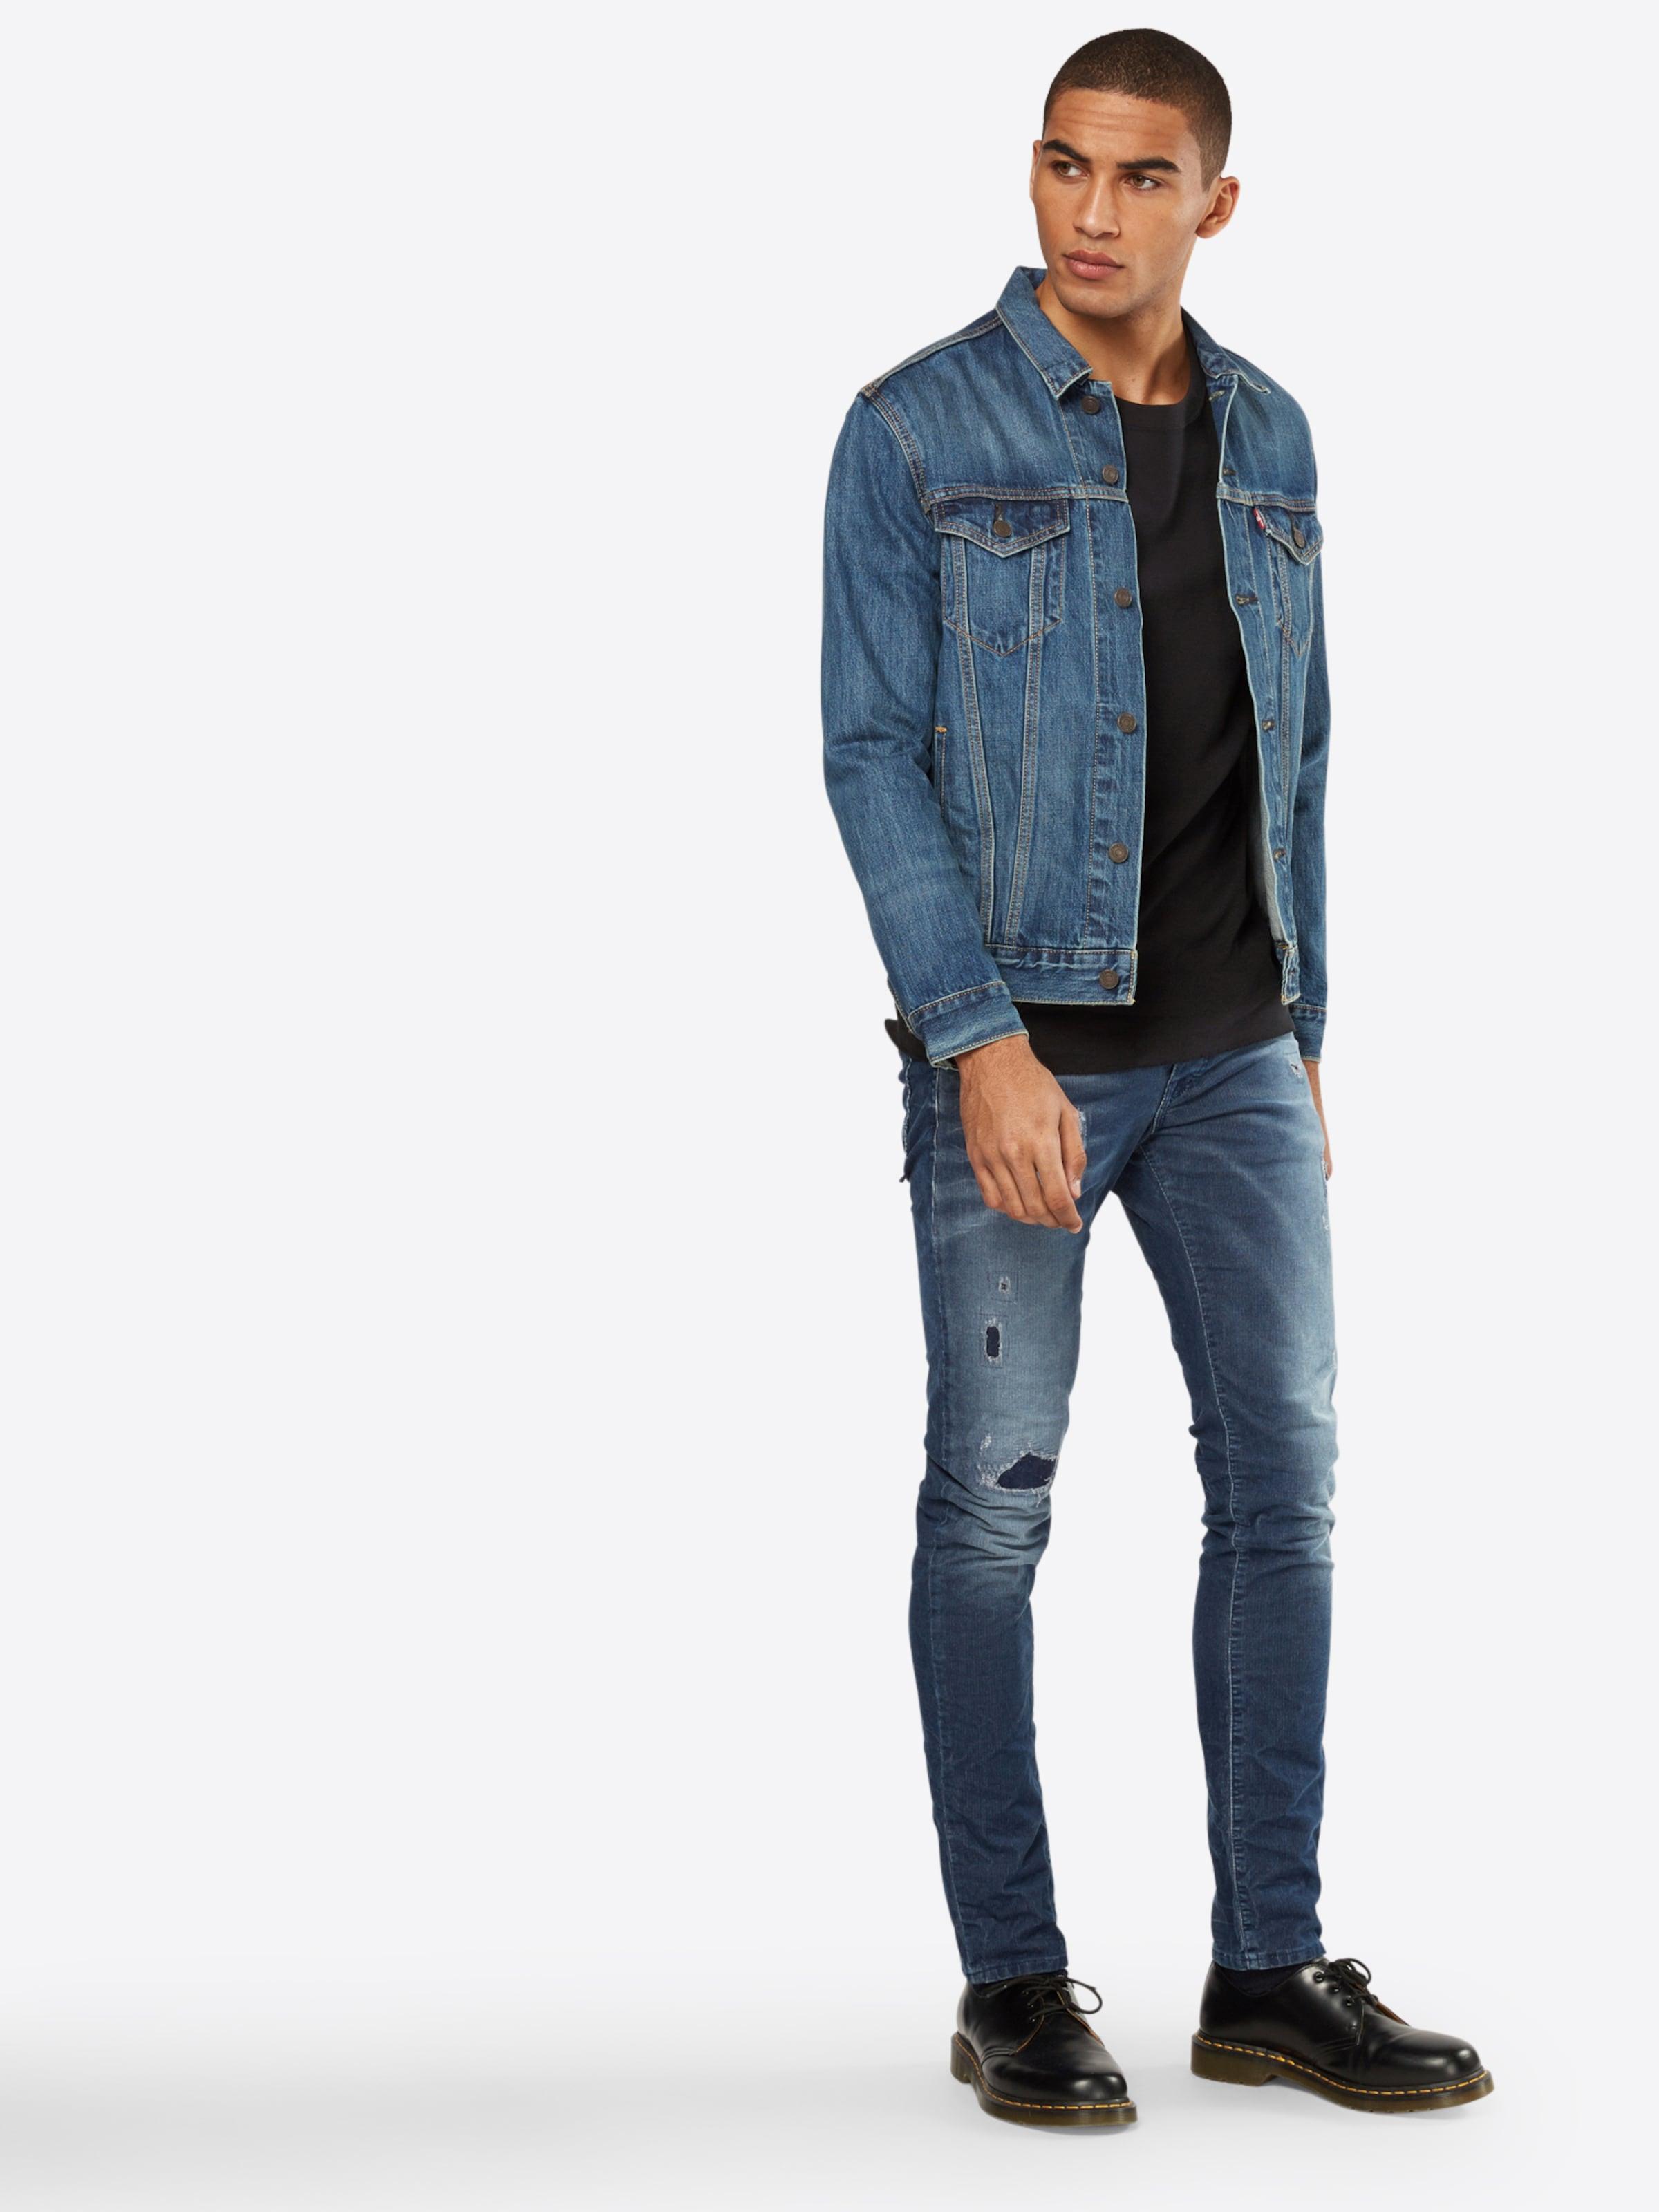 JACK & JONES Jeans 'JJIGLENN JJFOX BL 803 INDIGO CORD' Günstig Kaufen Besten Verkauf OM8FIZXRUV